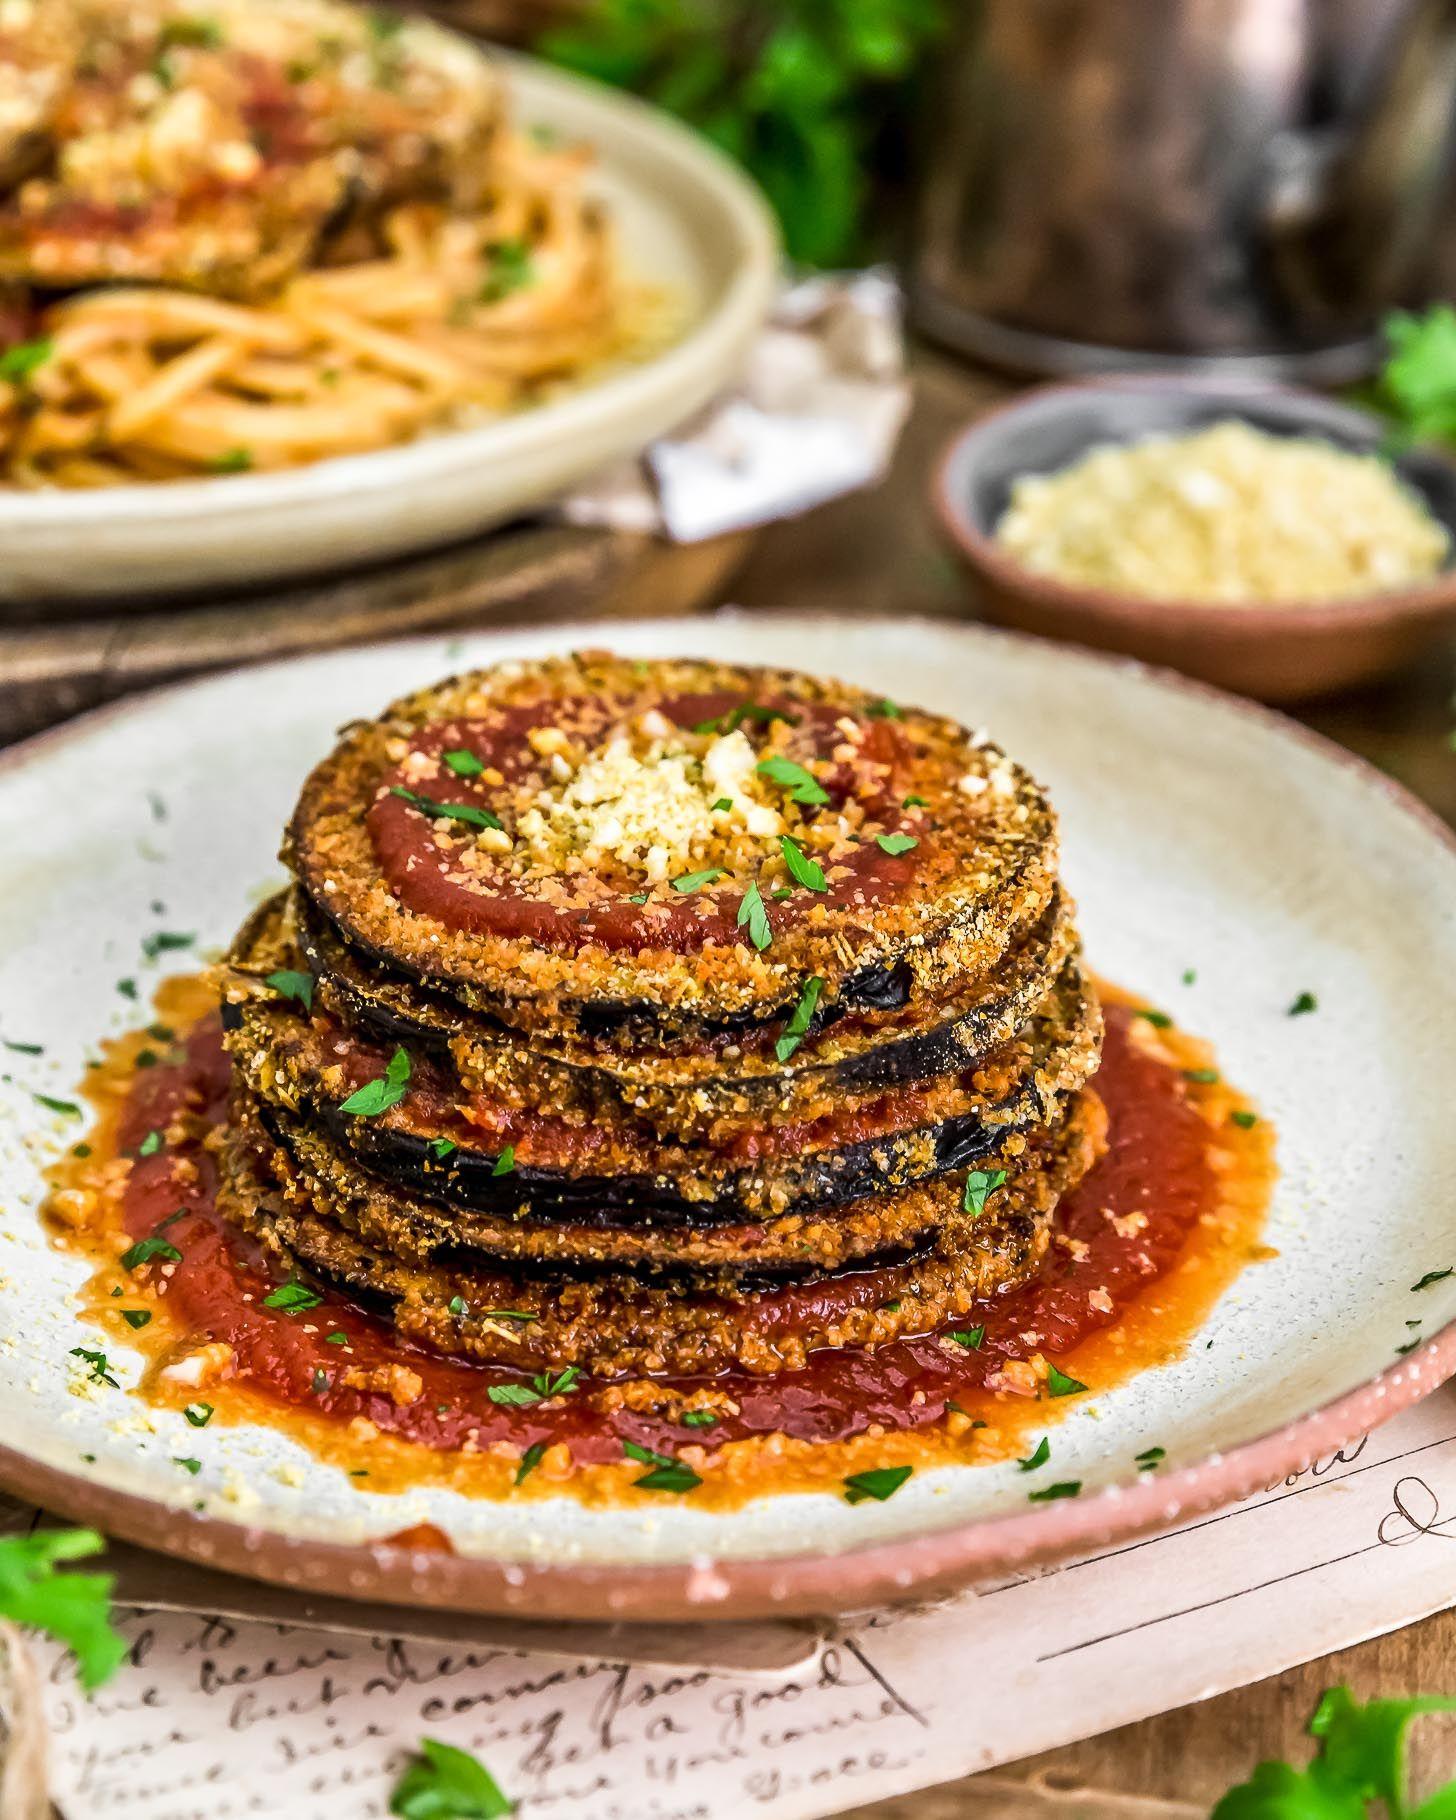 Vegan Eggplant Parmesan Monkey And Me Kitchen Adventures Recipe In 2020 Vegan Eggplant Parmesan Vegan Eggplant Eggplant Parmesan